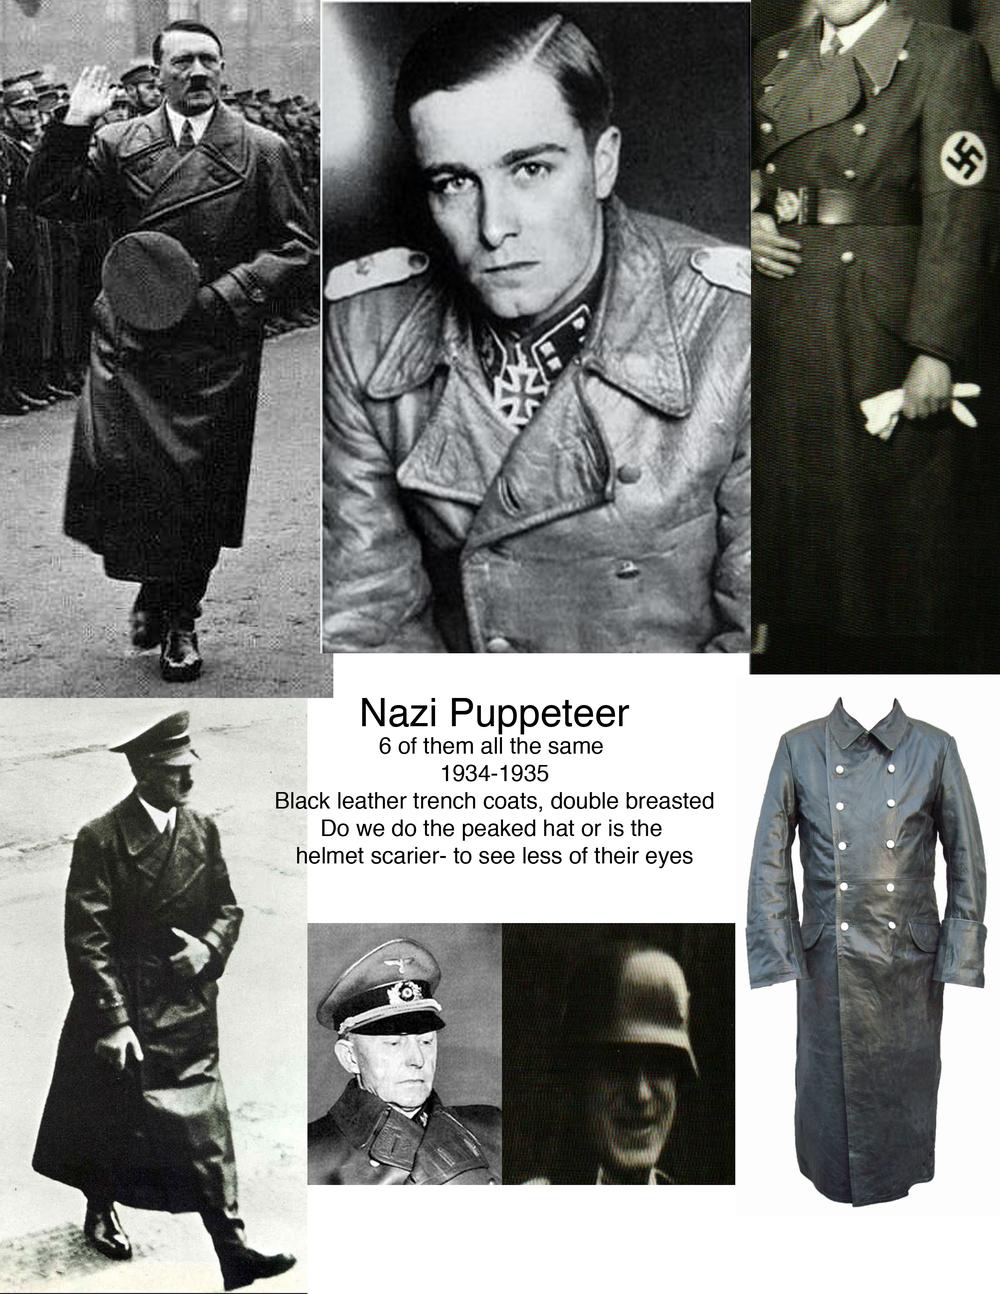 Nazi puppeteer